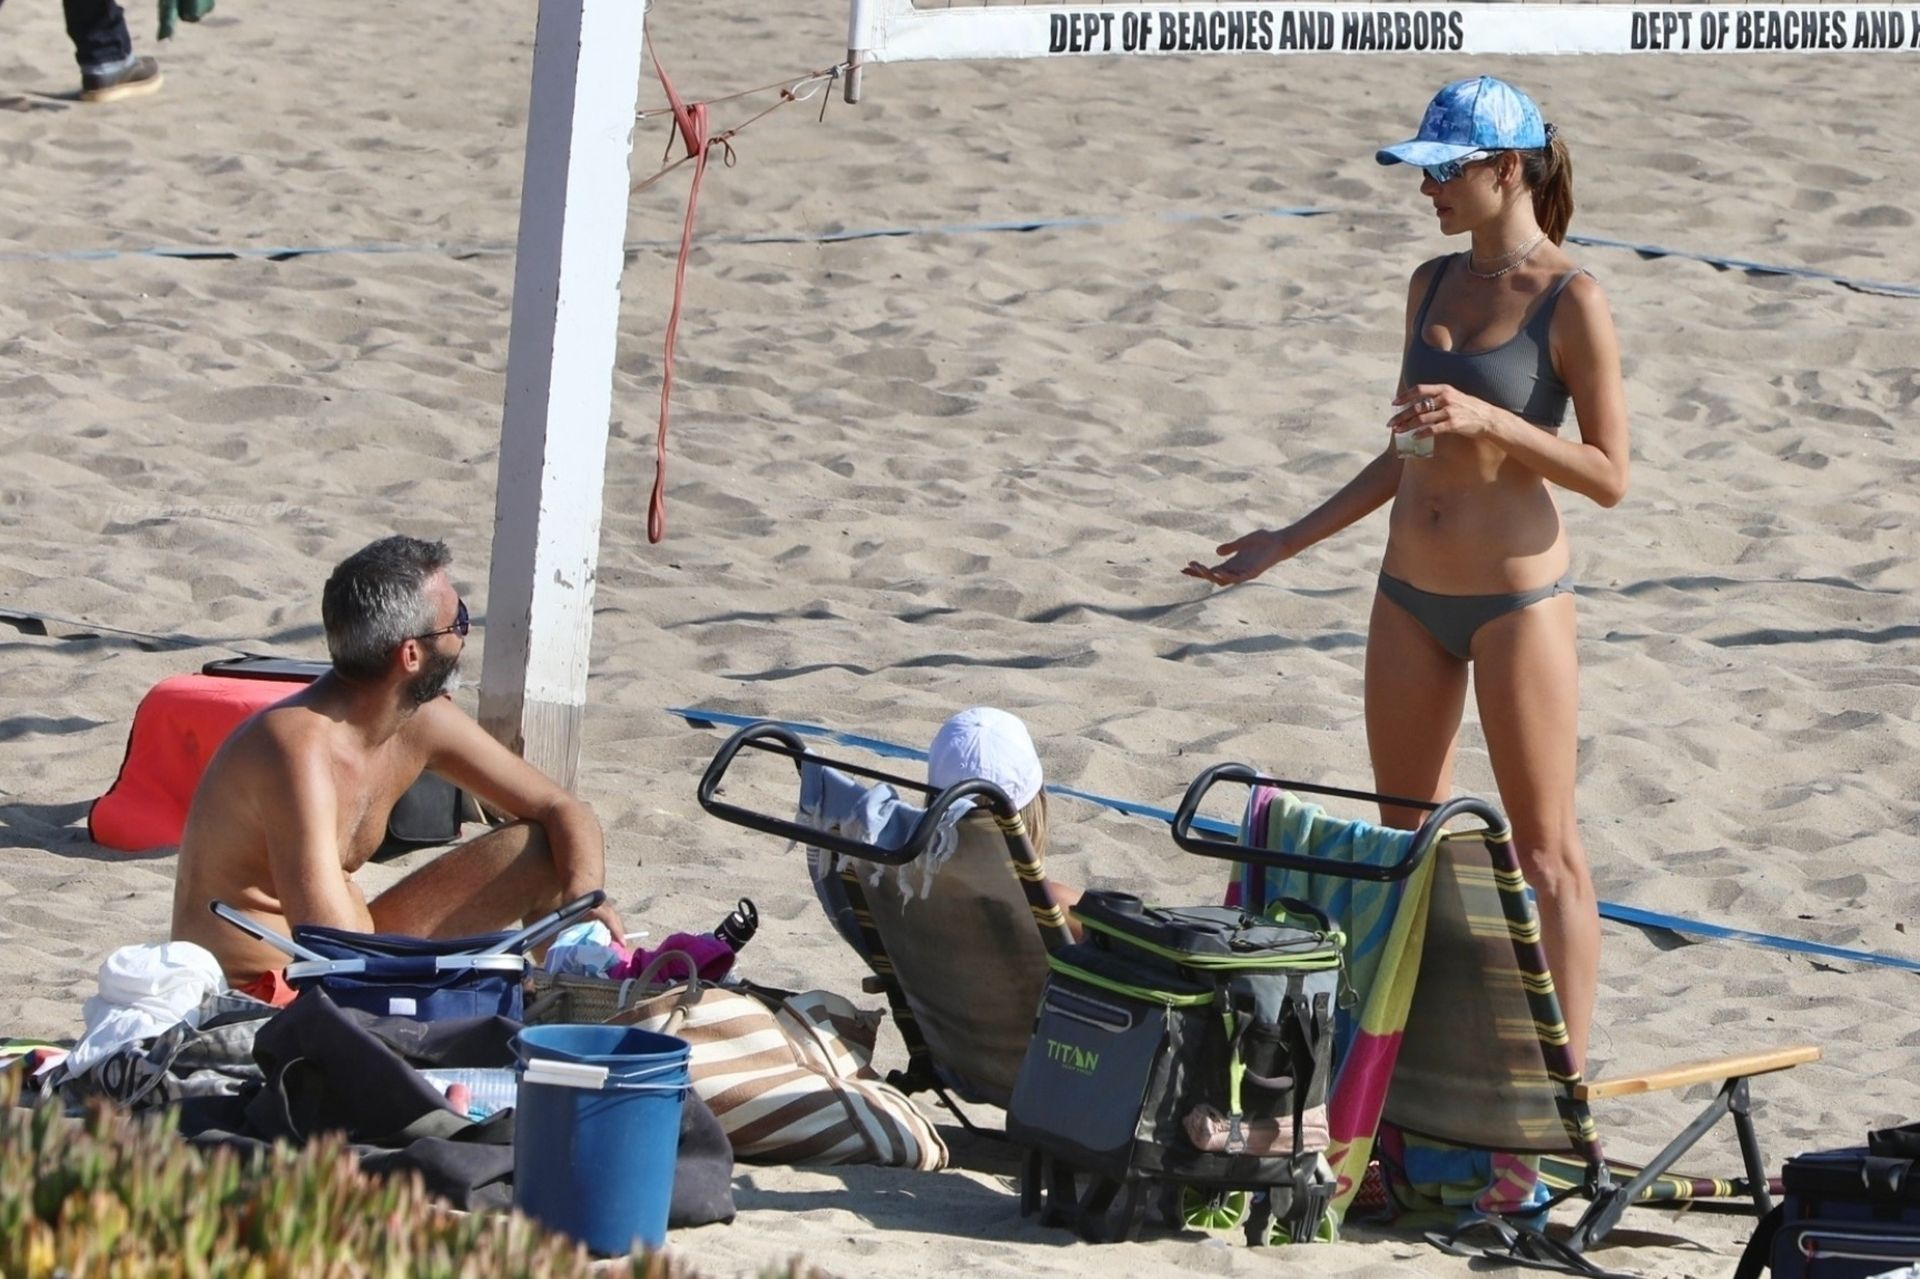 Alessandra-Ambrosio-Sexy-The-Fappening-Blog-2-3.jpg